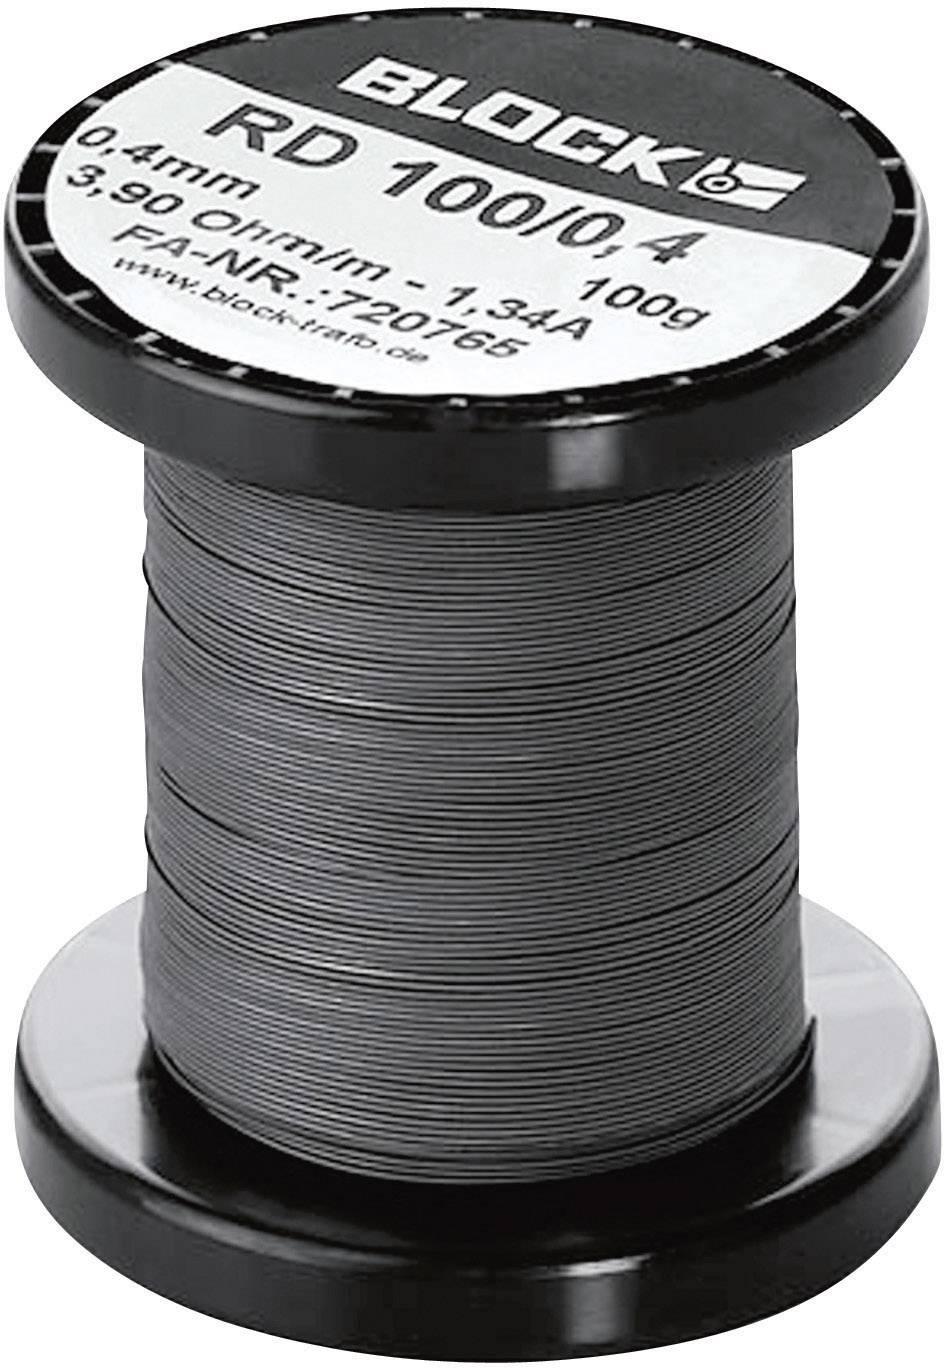 Odporový drát (konstantan) Block RD 100/0,2, 15.6 Ω/m, 357 m